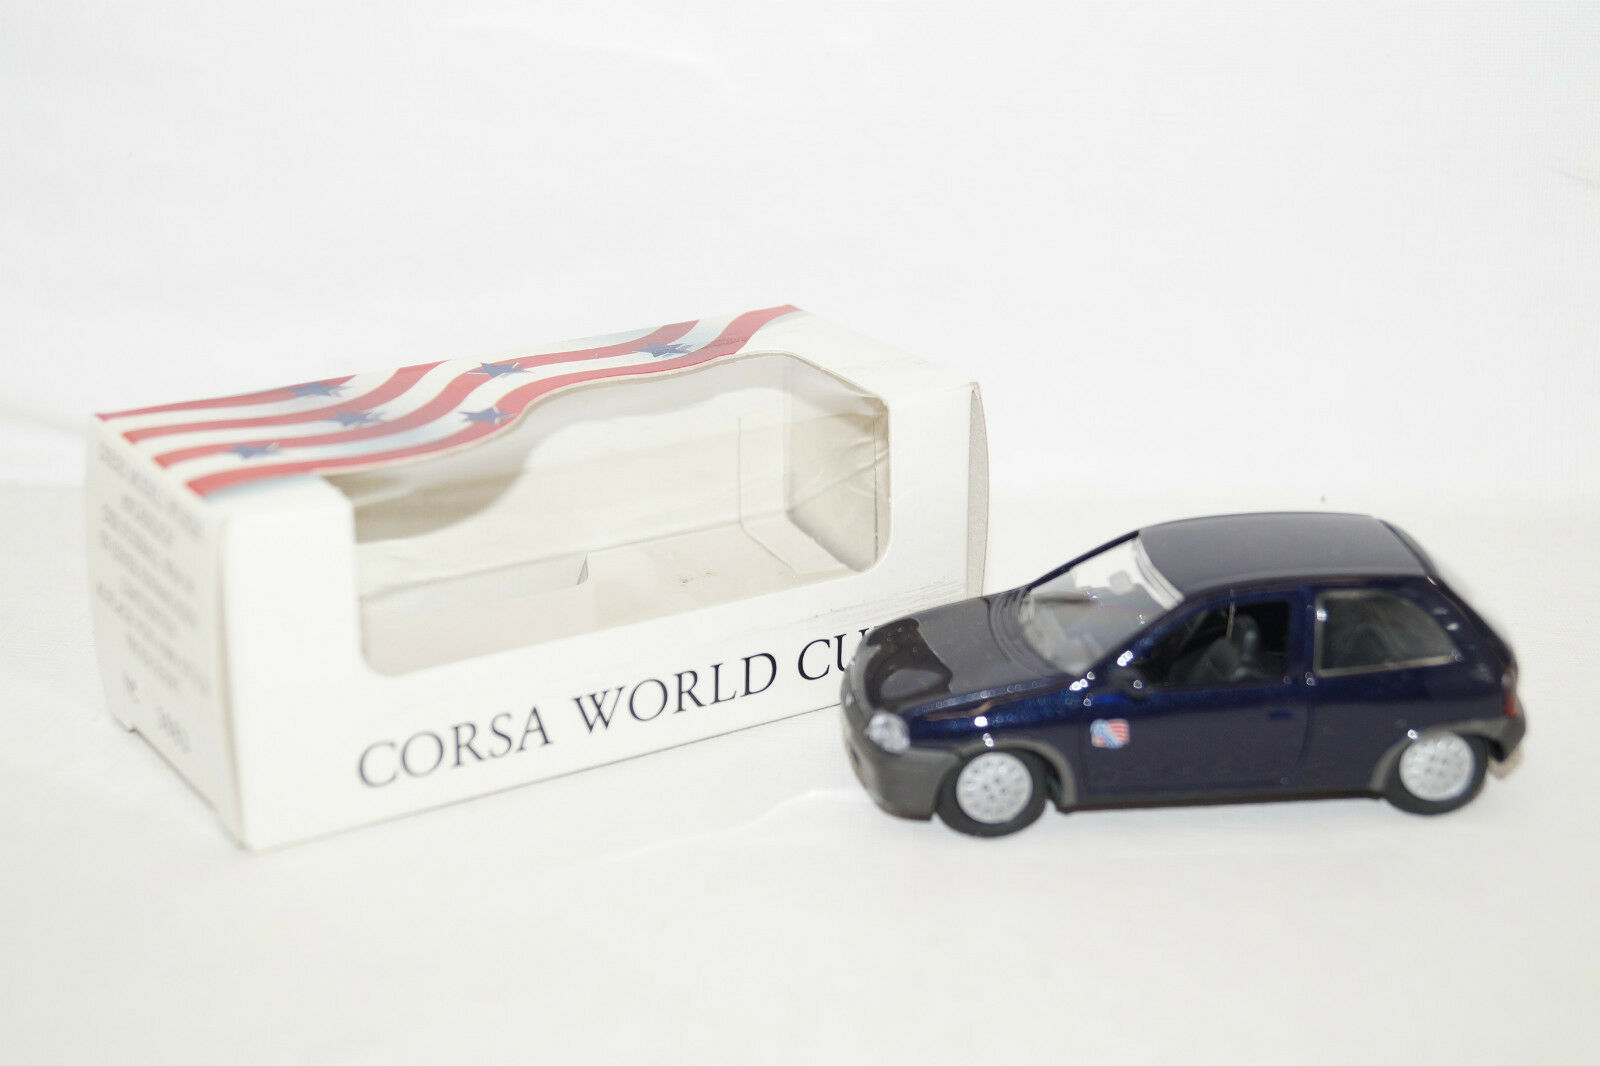 GAMA OPEL CORSA CORSA CORSA WORLD CUP Sondermodell WM 1994 USA dunkelblau 1 43 48b851